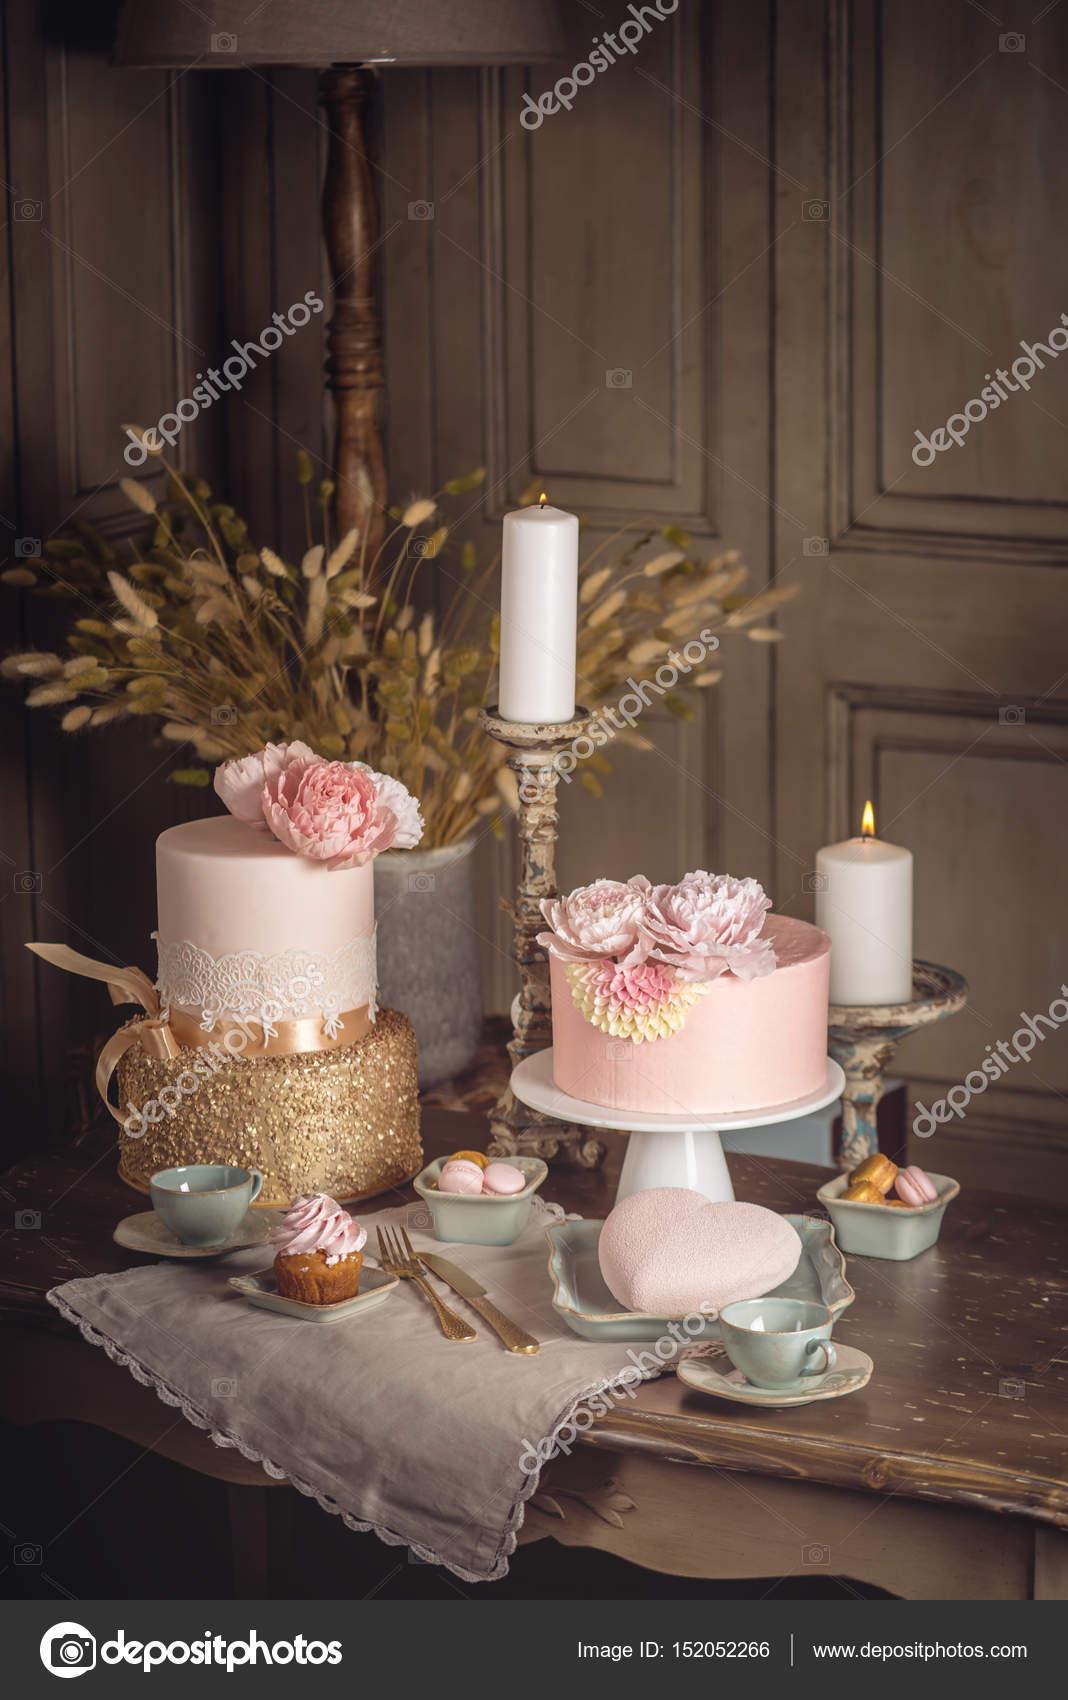 Sensational Rose Gold Birthday Cakes Luxury Wedding Table With A Beautiful Funny Birthday Cards Online Necthendildamsfinfo